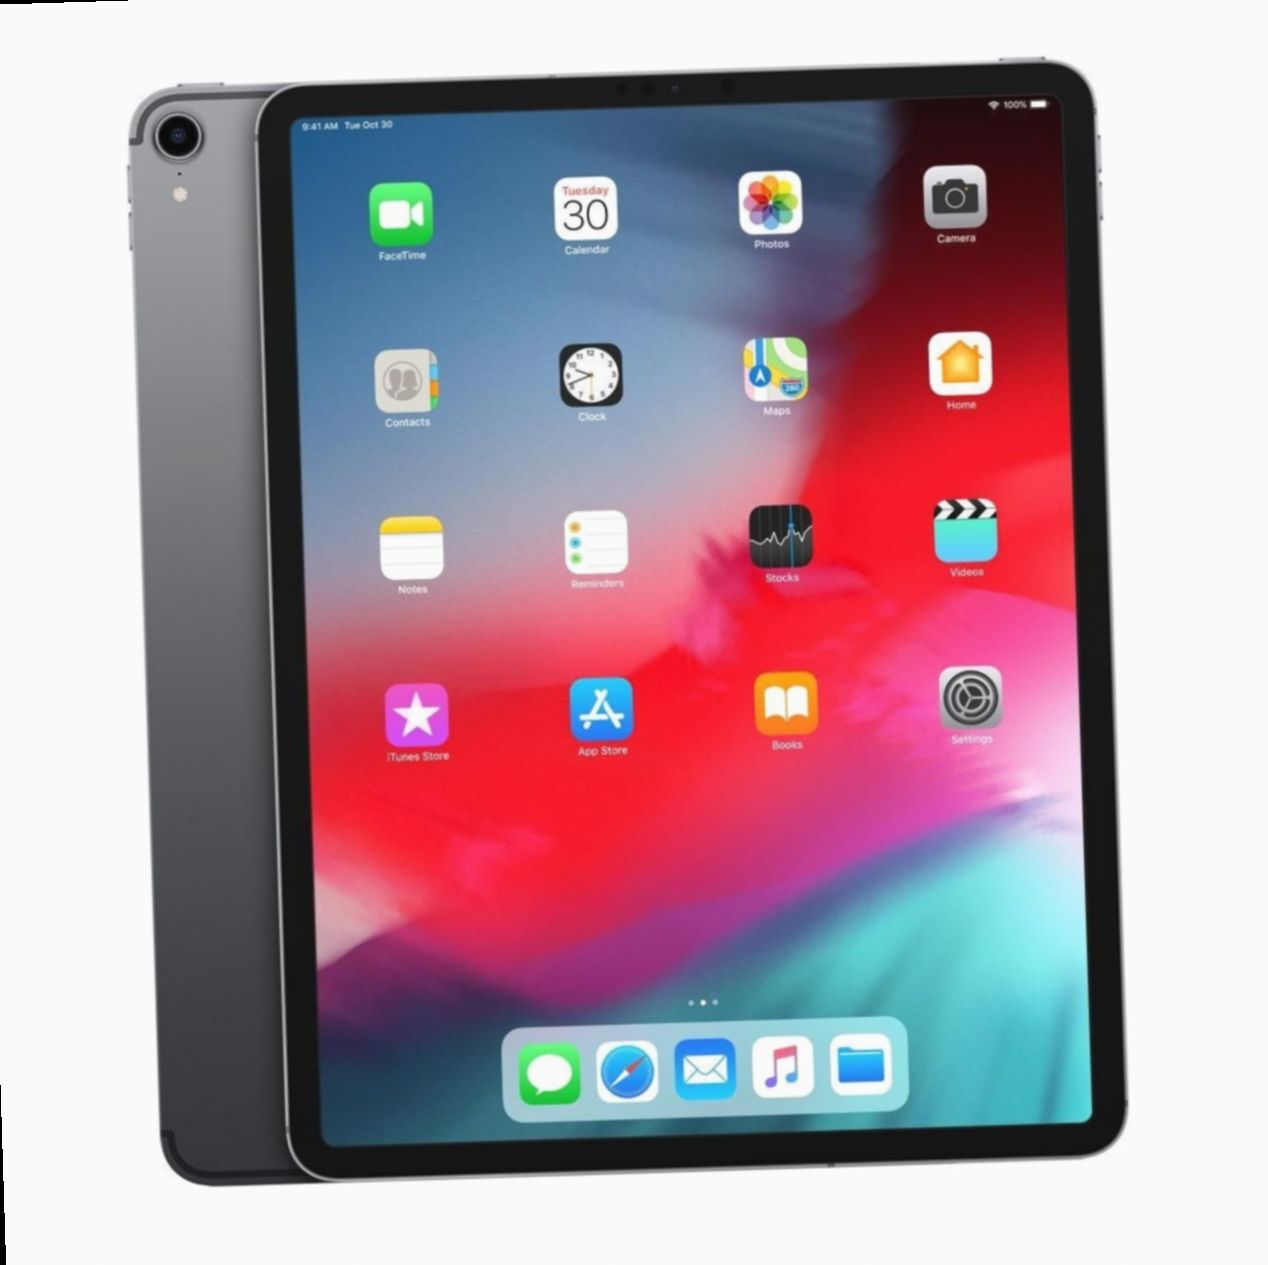 20 Wallpaper Ipad Pro 2018 Apple Ipad Pro Ipad Pro Apple Ipad